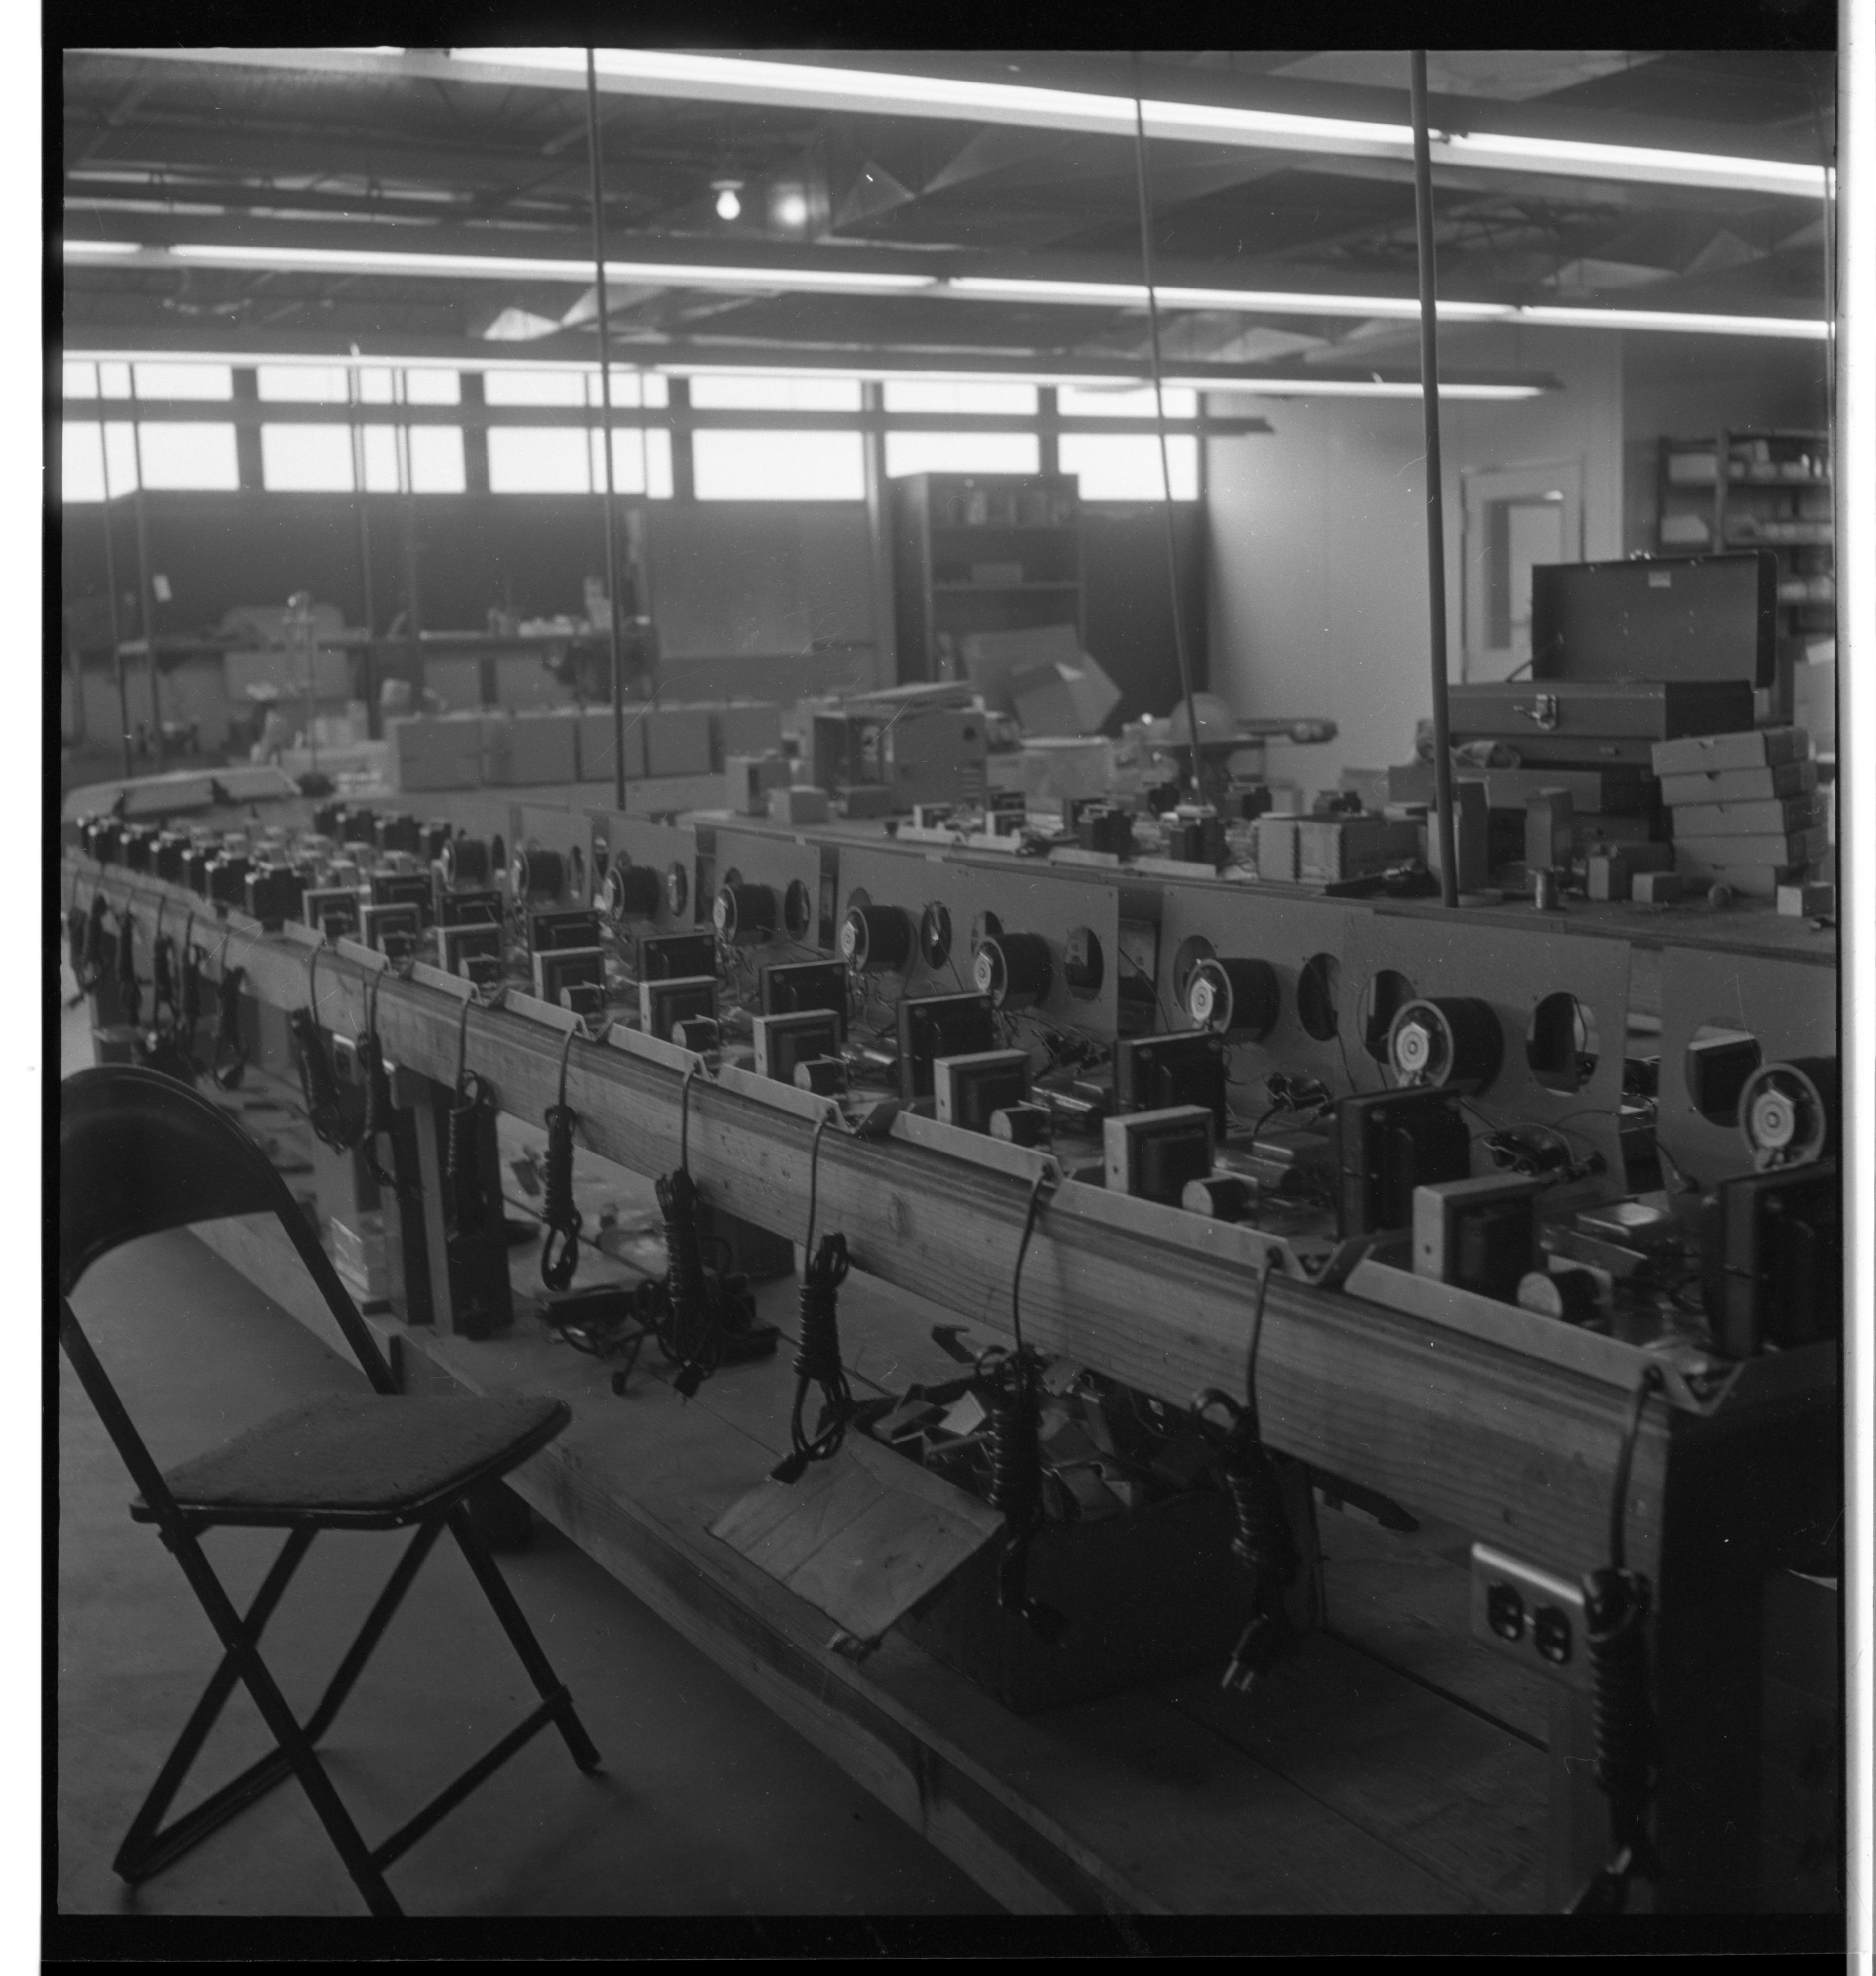 Gelman Instrument Co Ann Arbor District Library